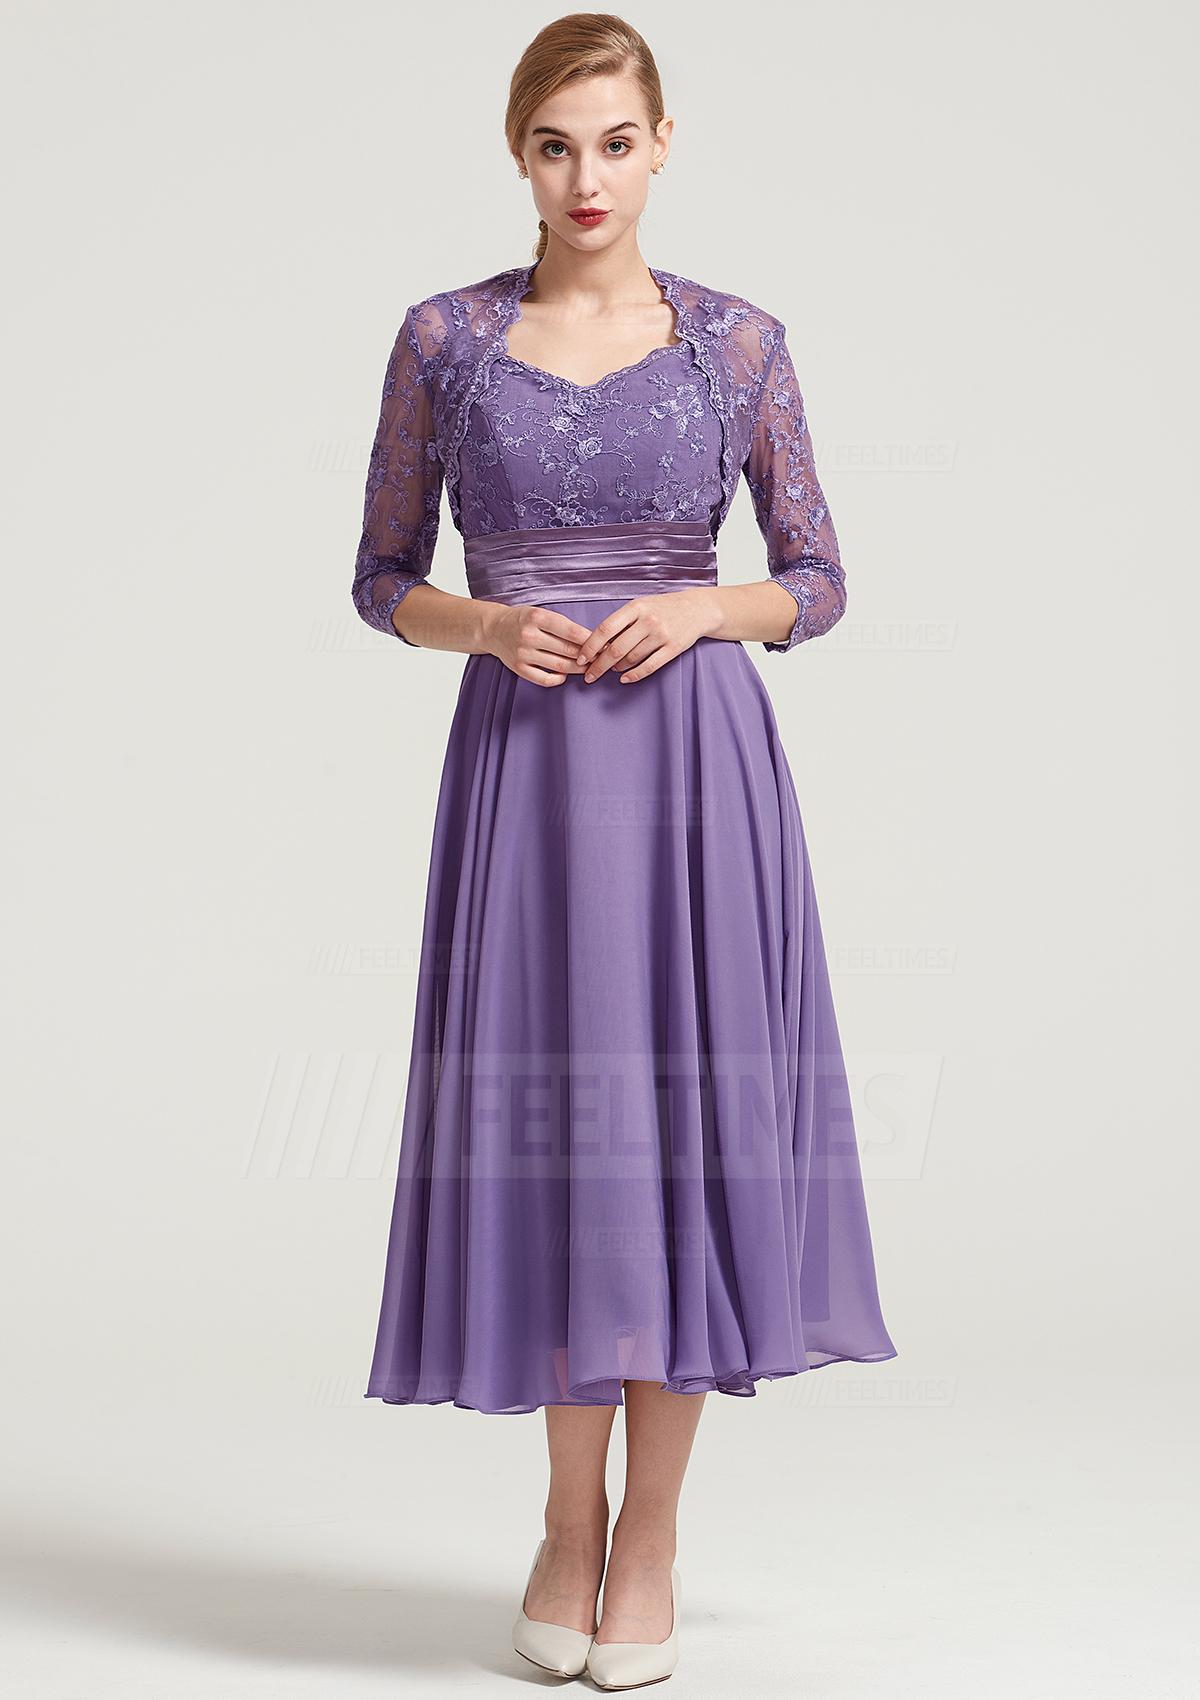 a2563a9ddb A-line Princess Sweetheart Sleeveless Tea-Length Chiffon Mother of ...